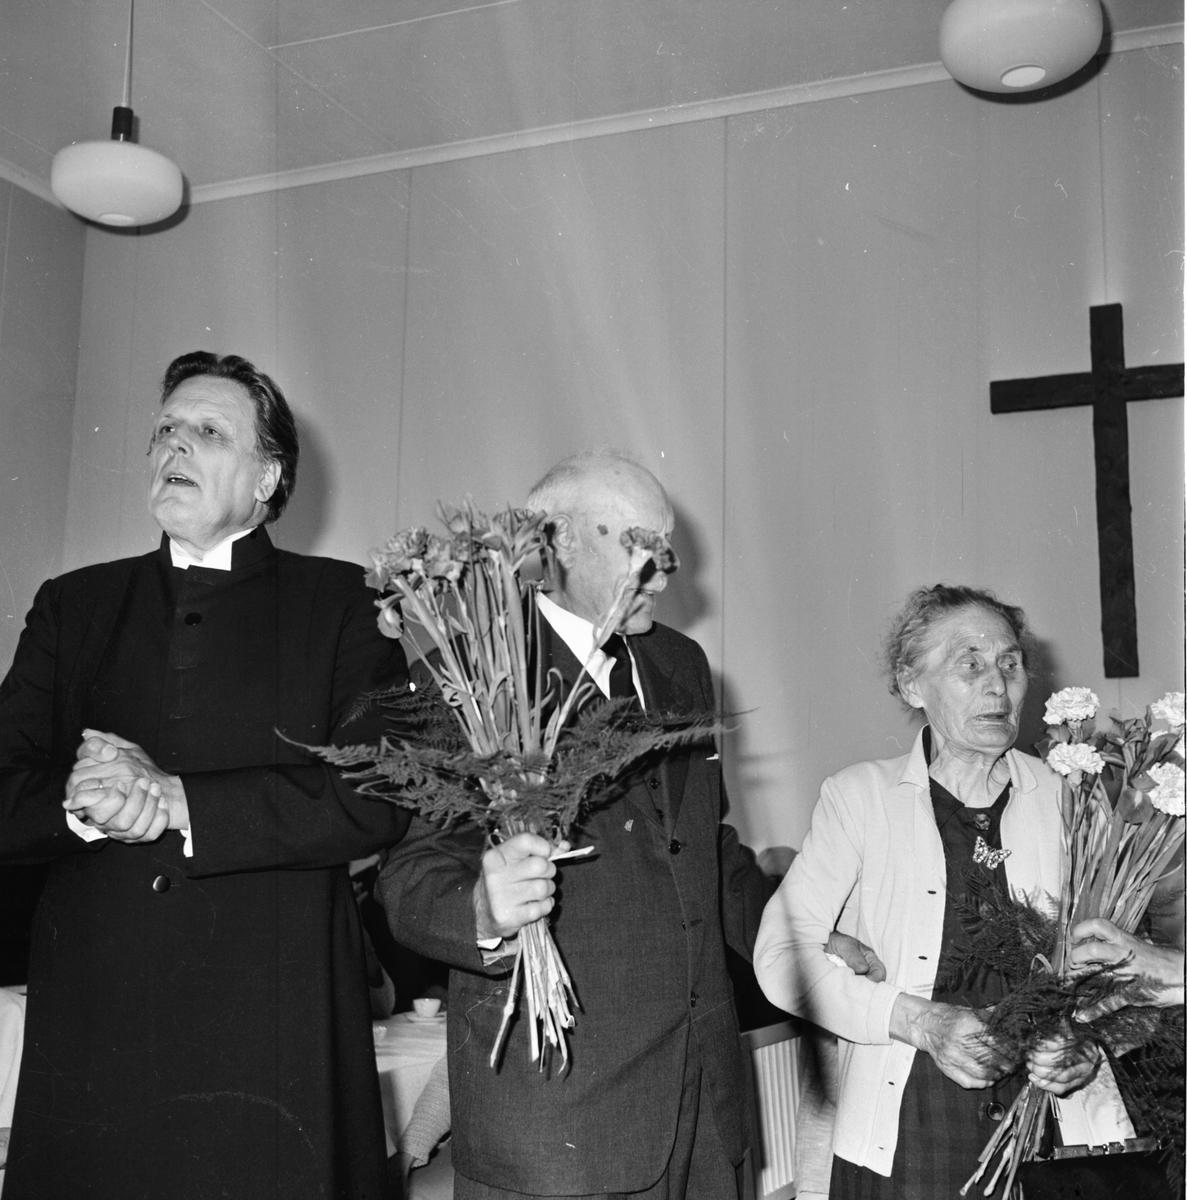 Arbrå, De gamlas dag, Sept 1970